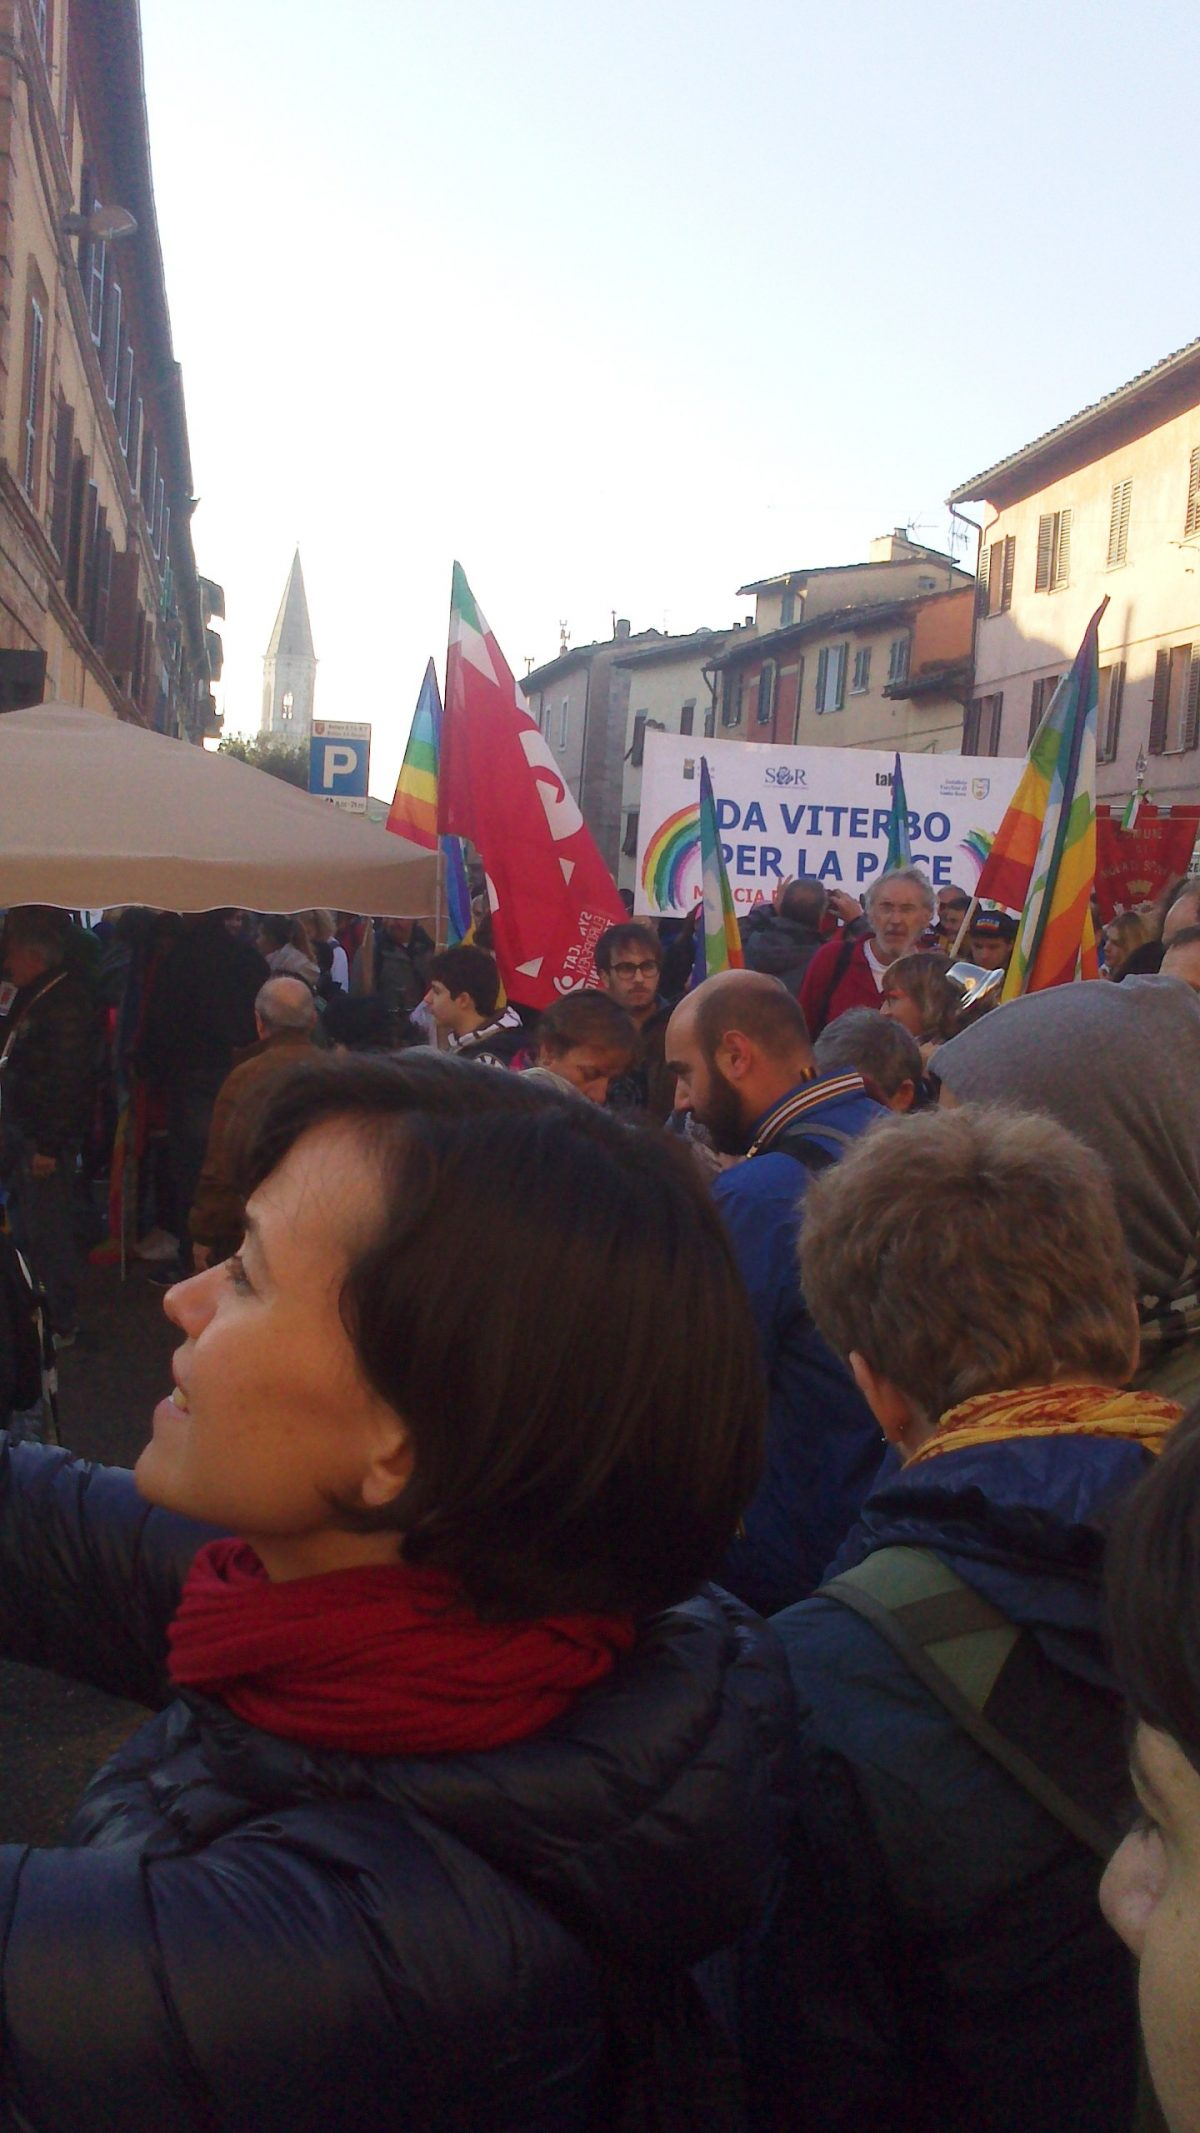 Da Perugia ad Assisi, contro l'indifferenza